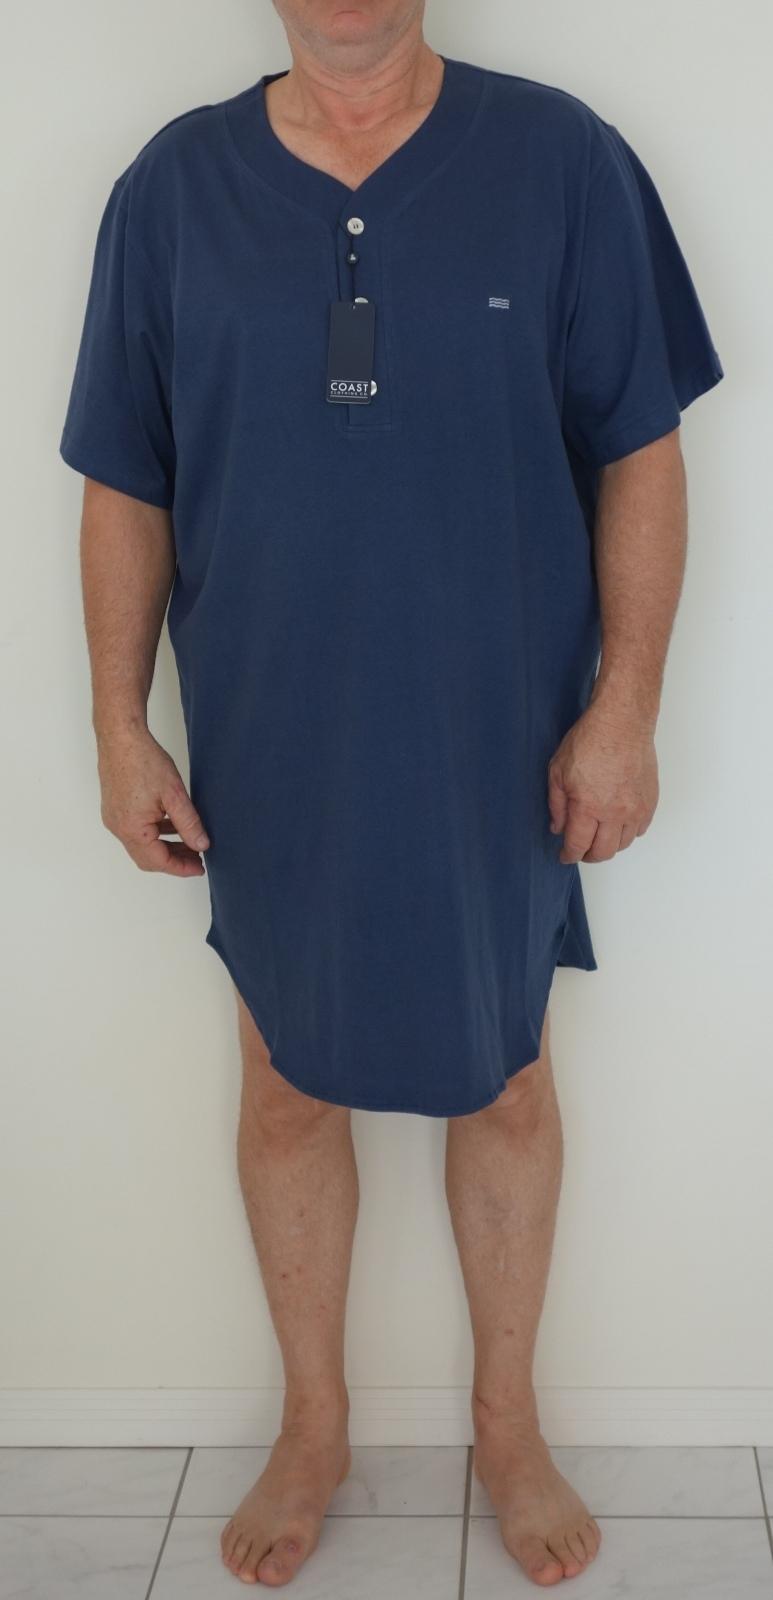 Sleep Shirts For Men